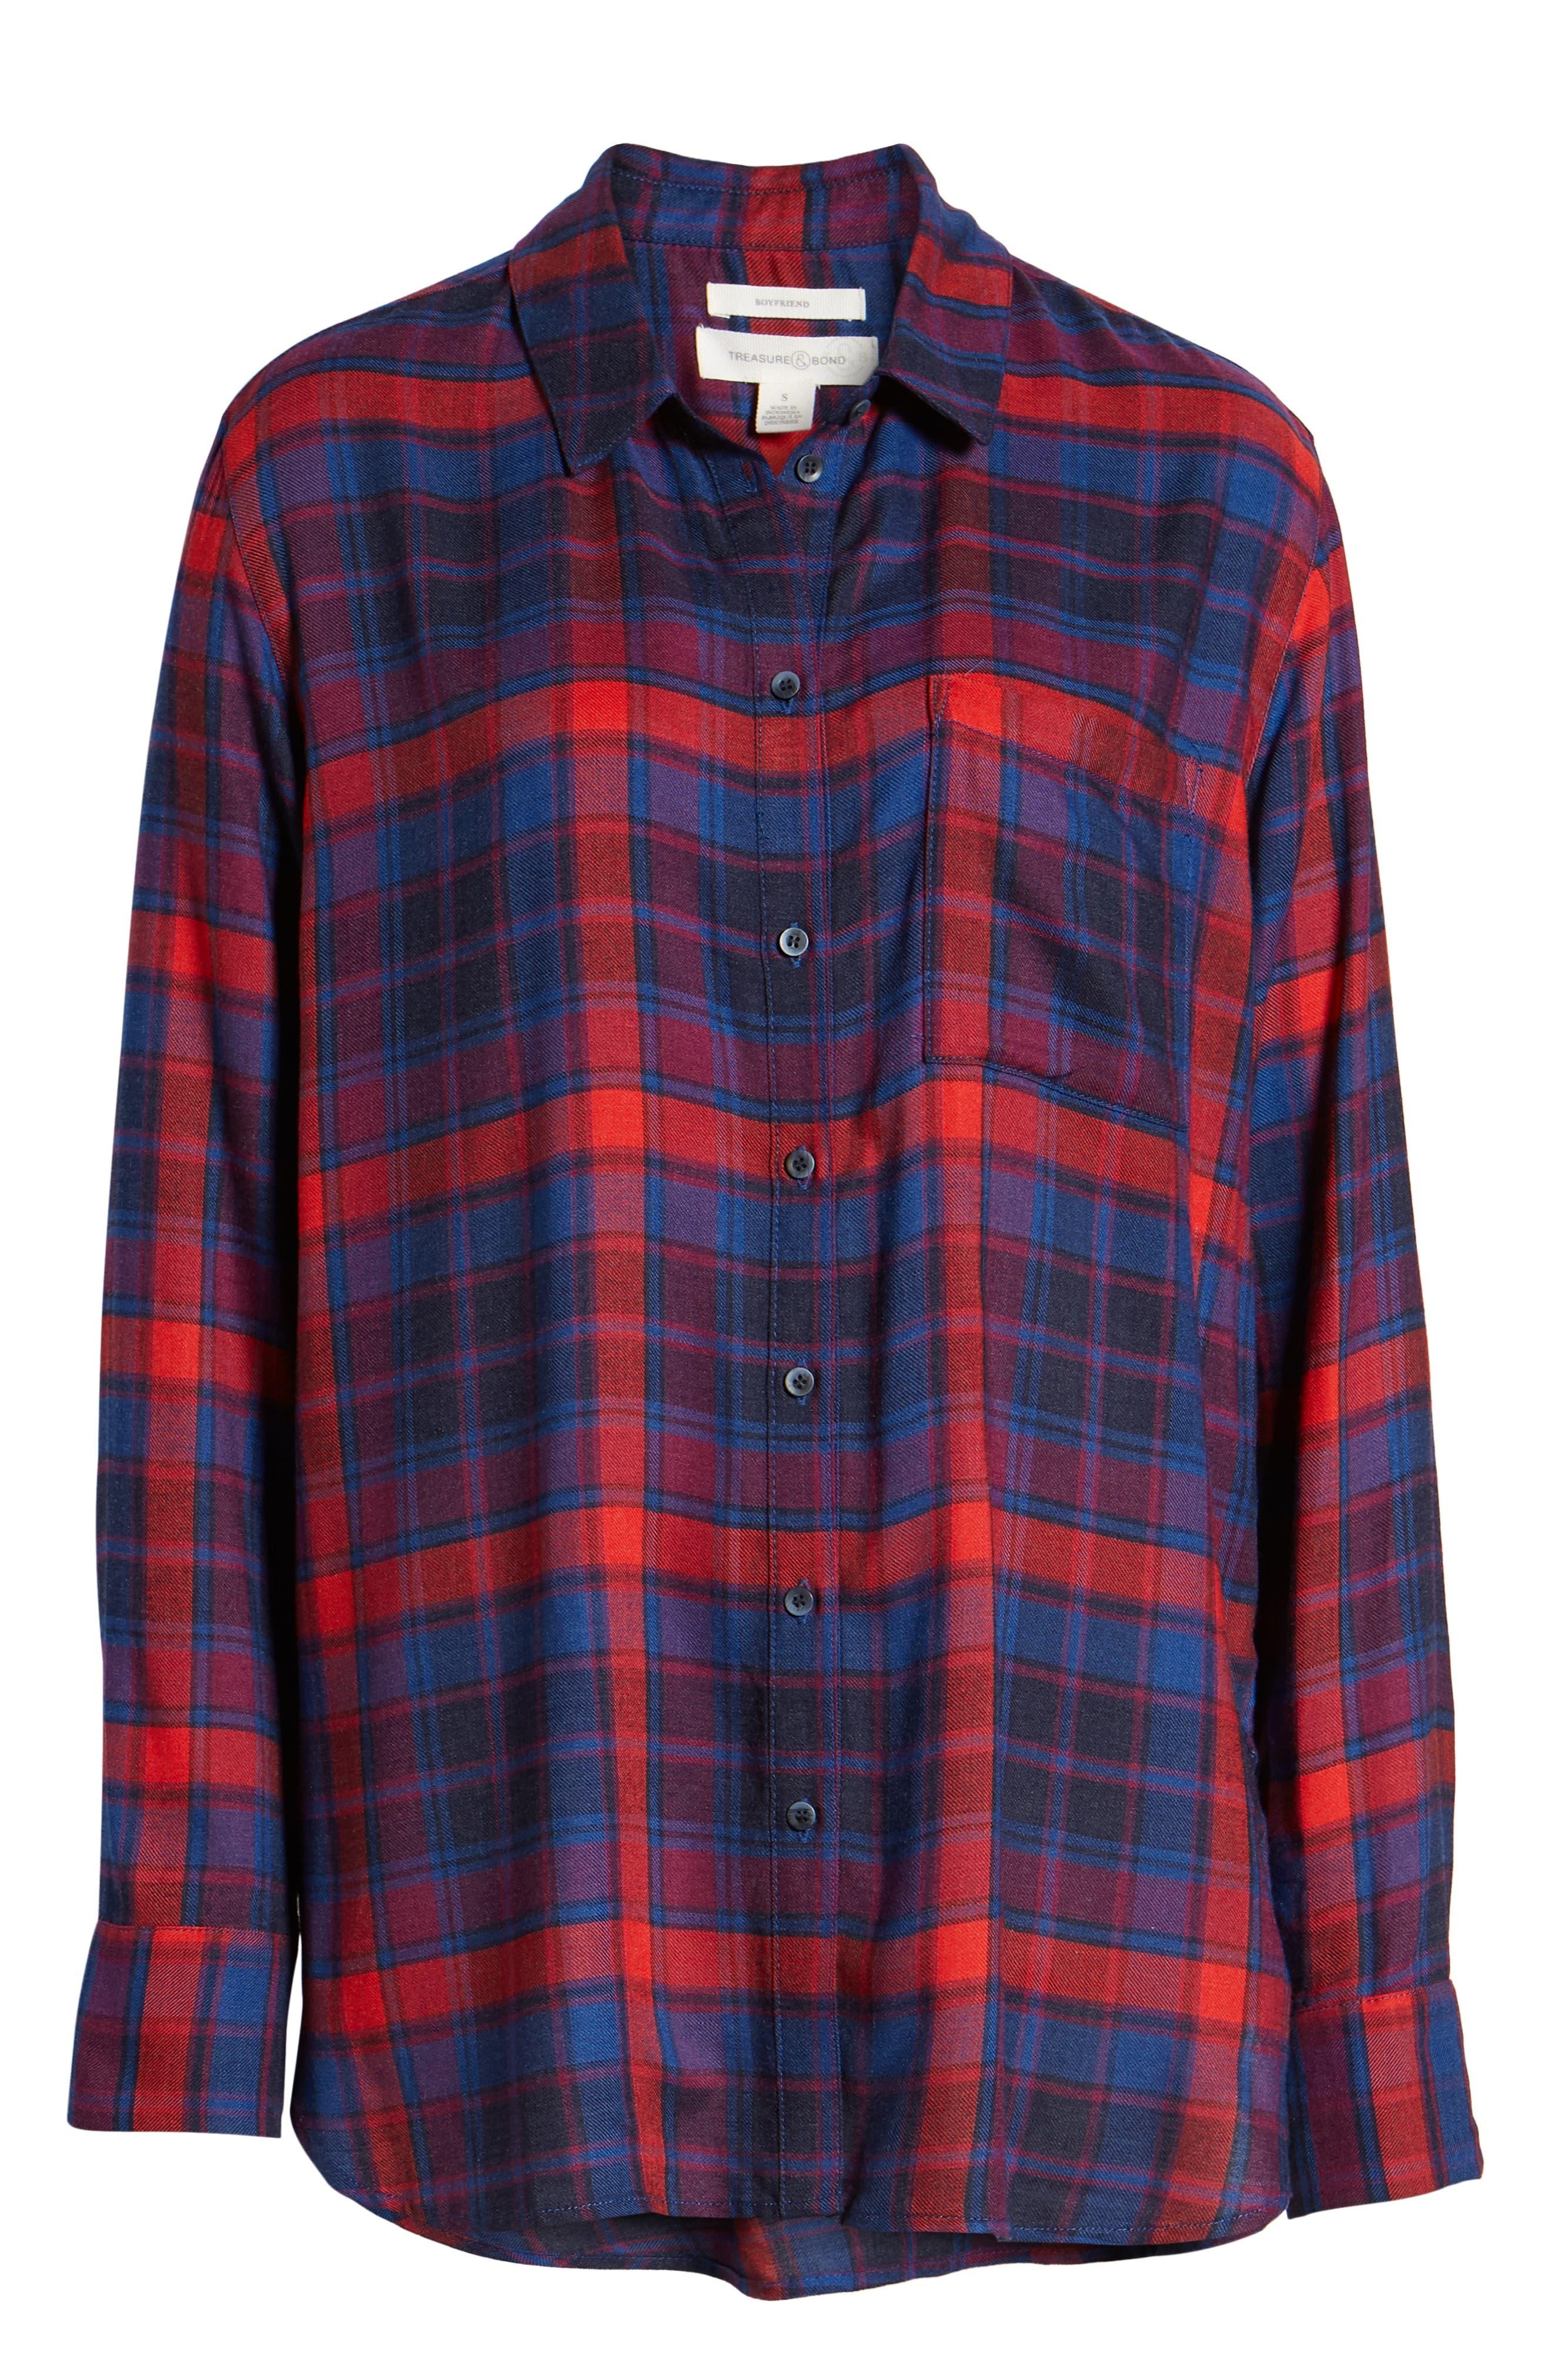 Plaid Boyfriend Shirt,                             Alternate thumbnail 6, color,                             BLUE SODALIGHT BEAMING PLAID